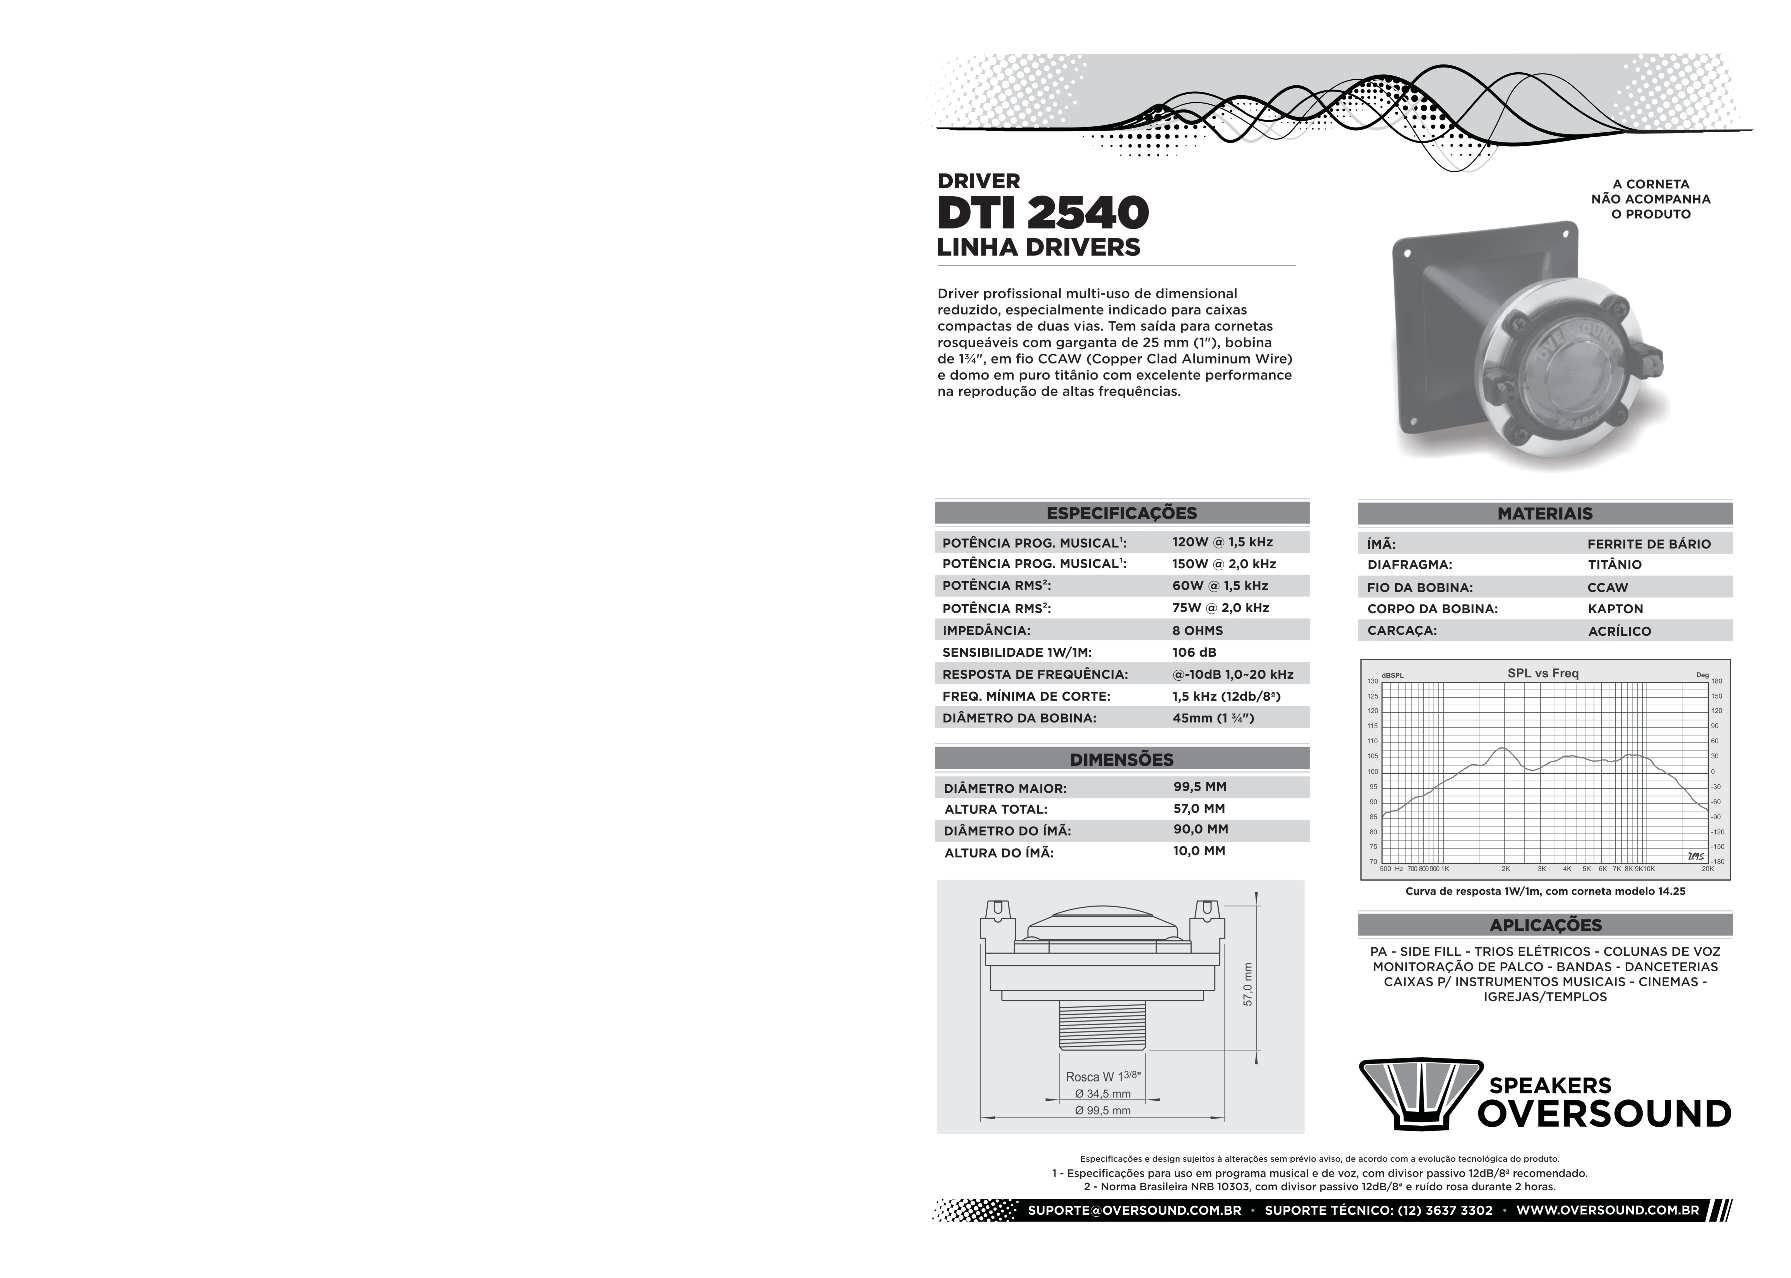 Driver DTI 2540 - Oversound  - RS Som e Luz!